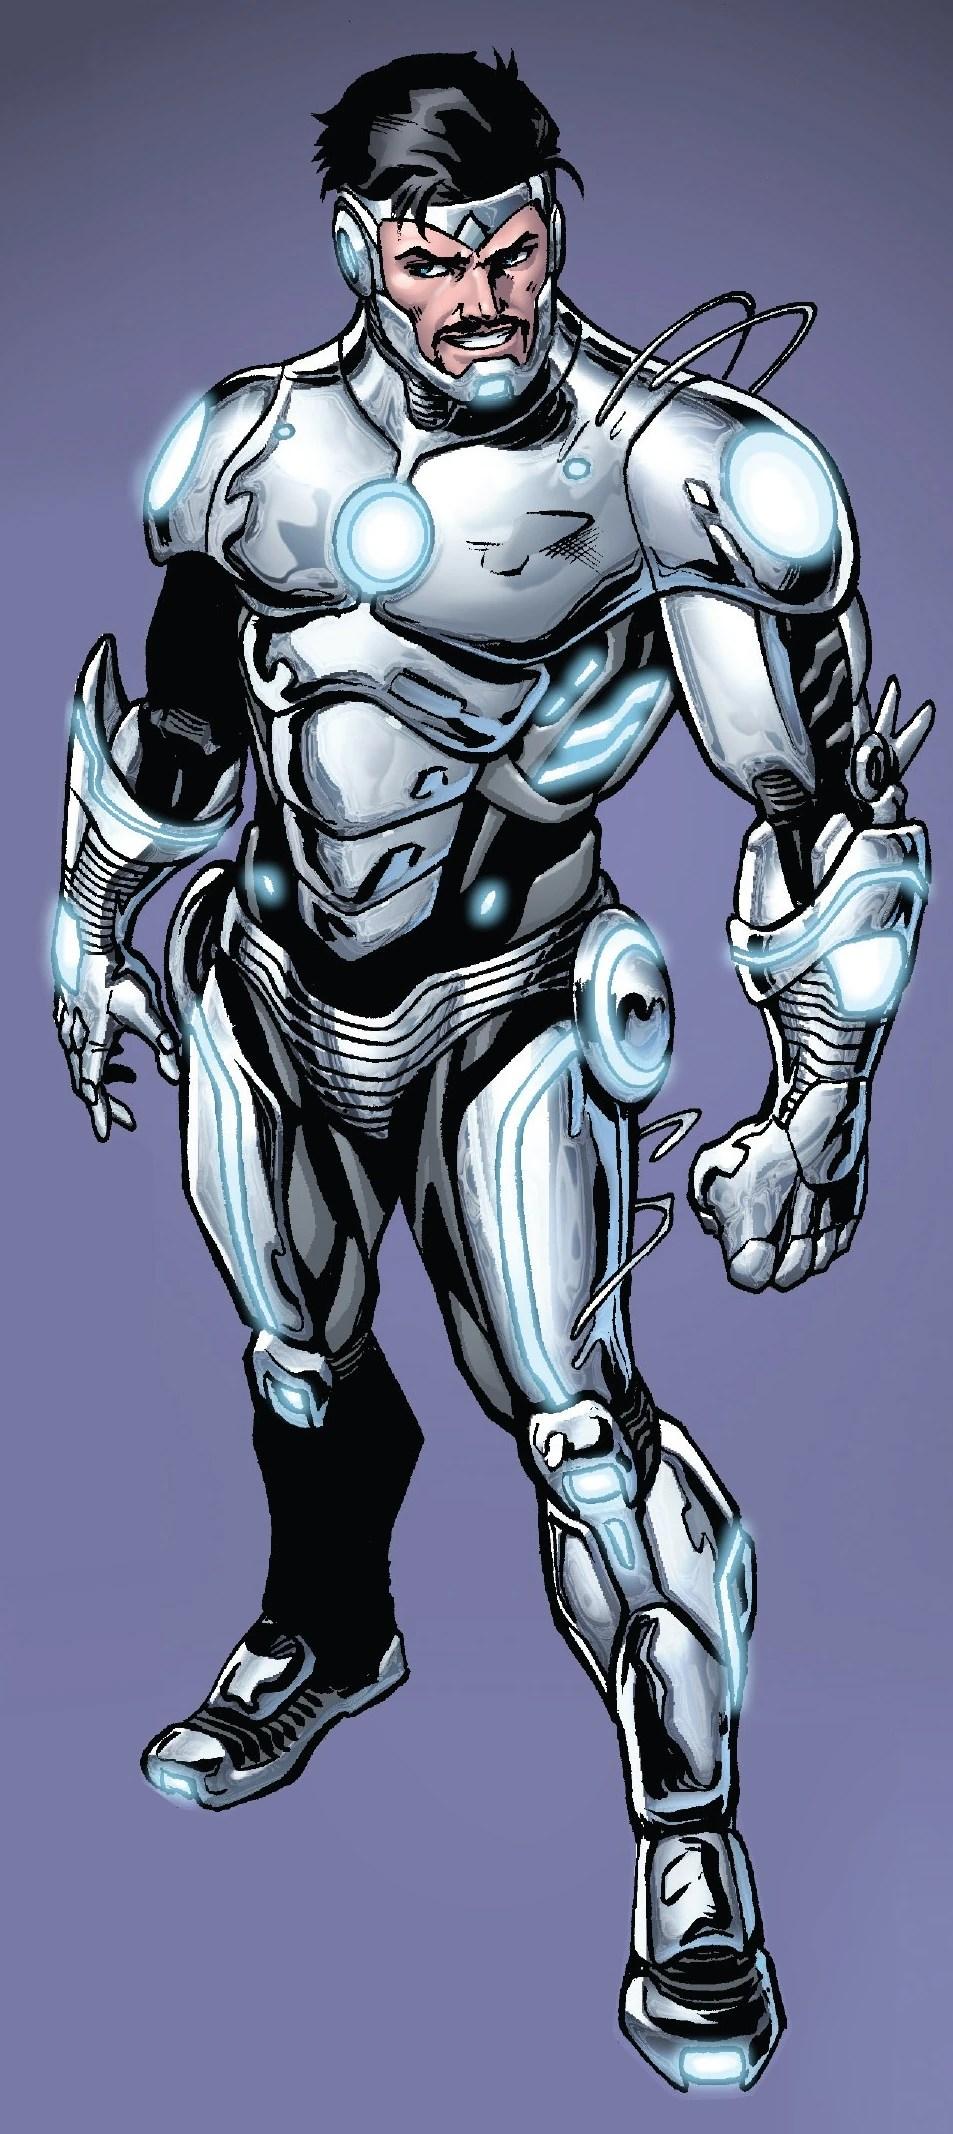 Fall Of Cybertron Wallpaper Iron Man Symbiote Www Pixshark Com Images Galleries